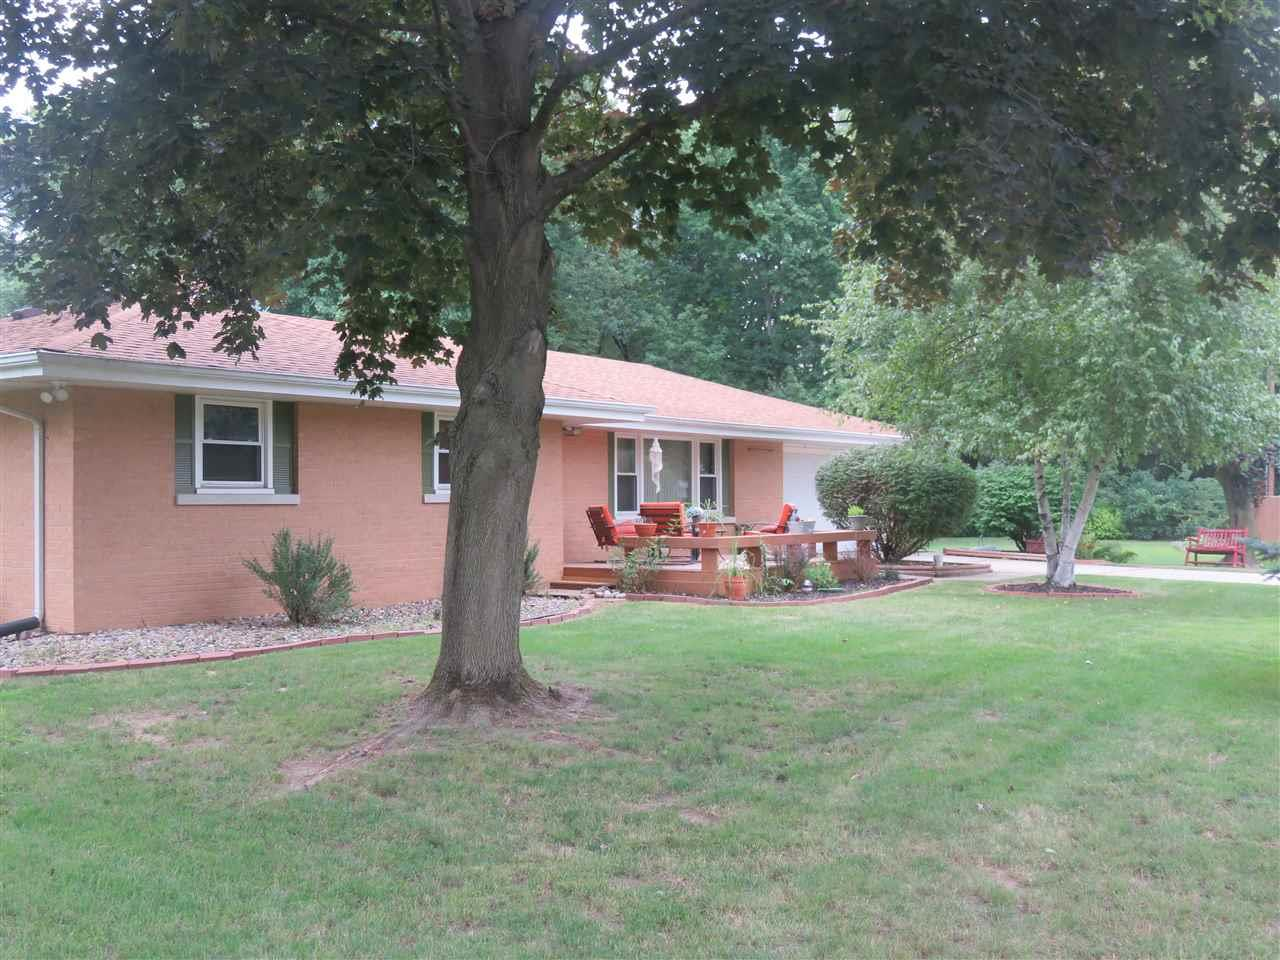 23559 County Road 16 Elkhart, IN 46516